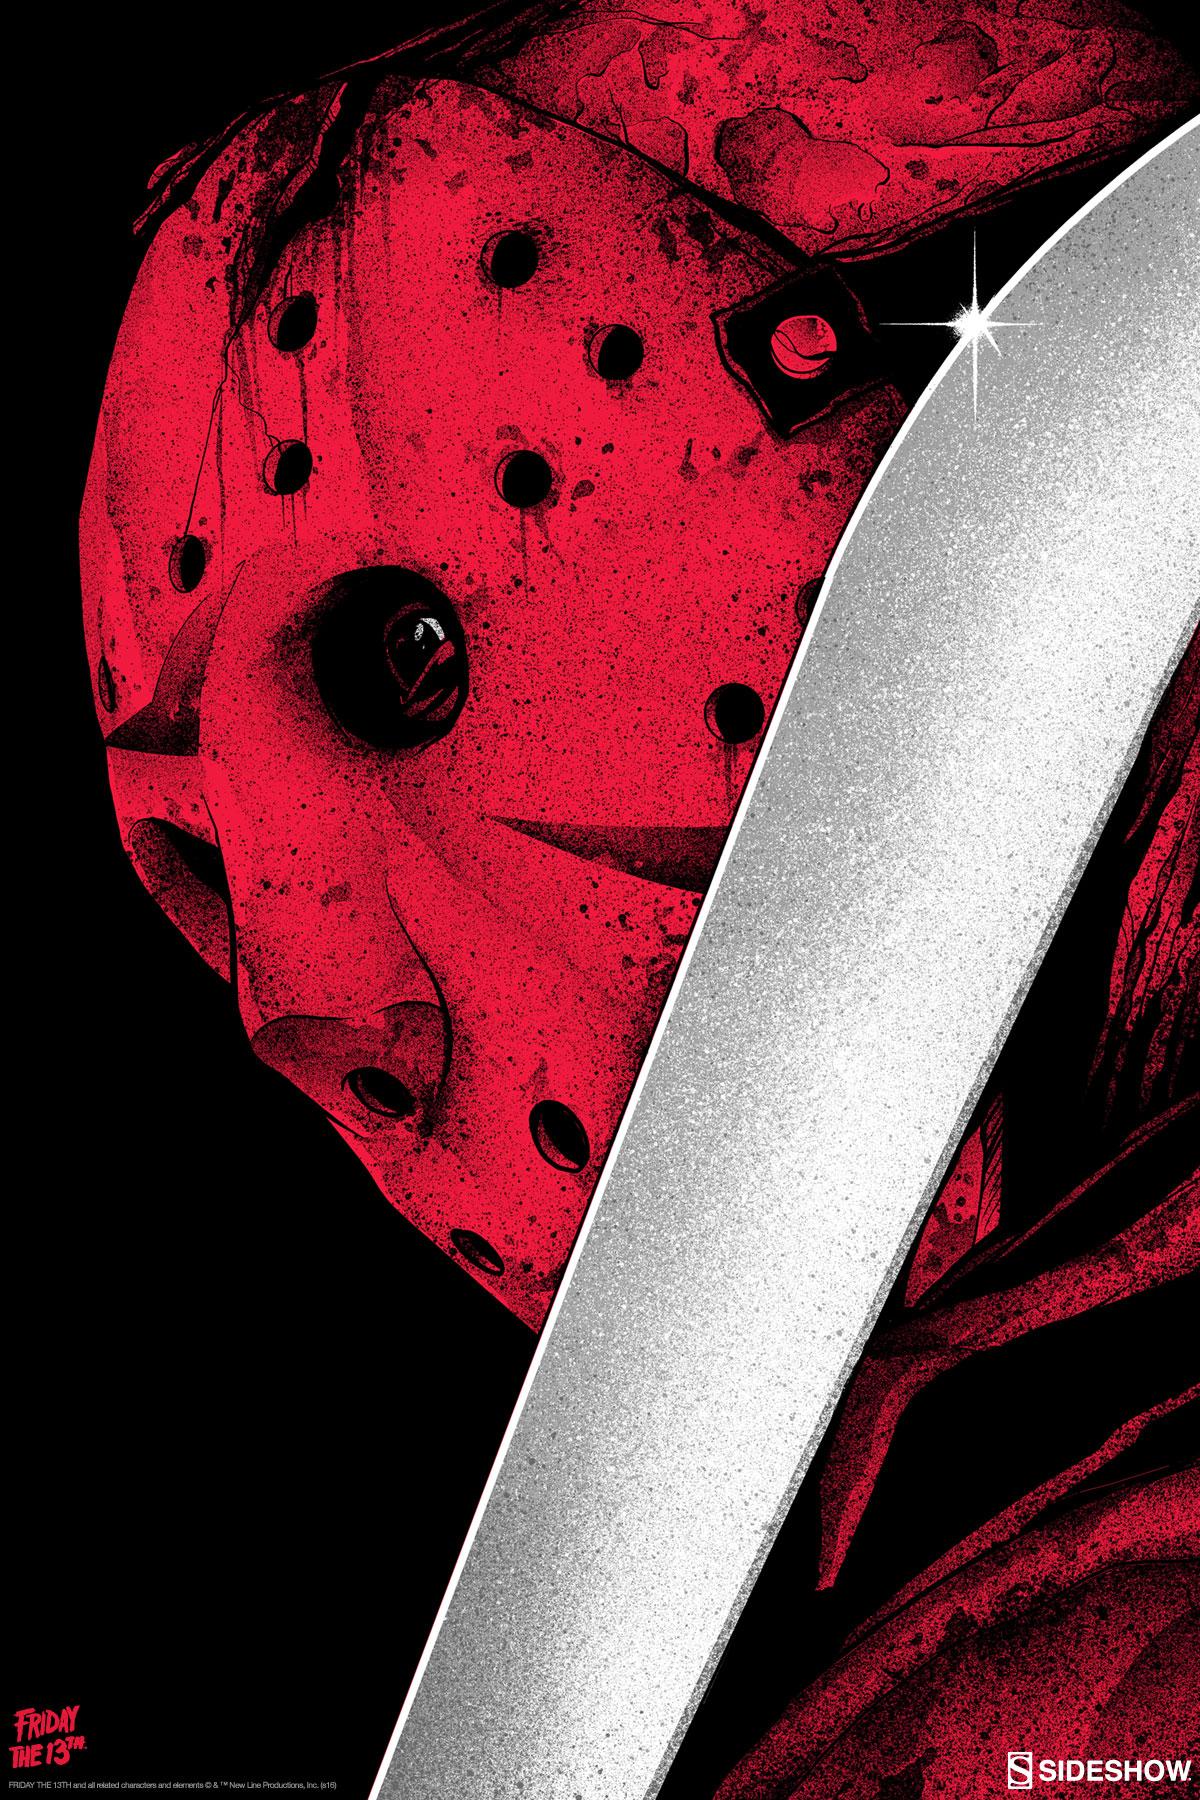 Jason Voorhees Screen-Print by Matt Ryan Tobin